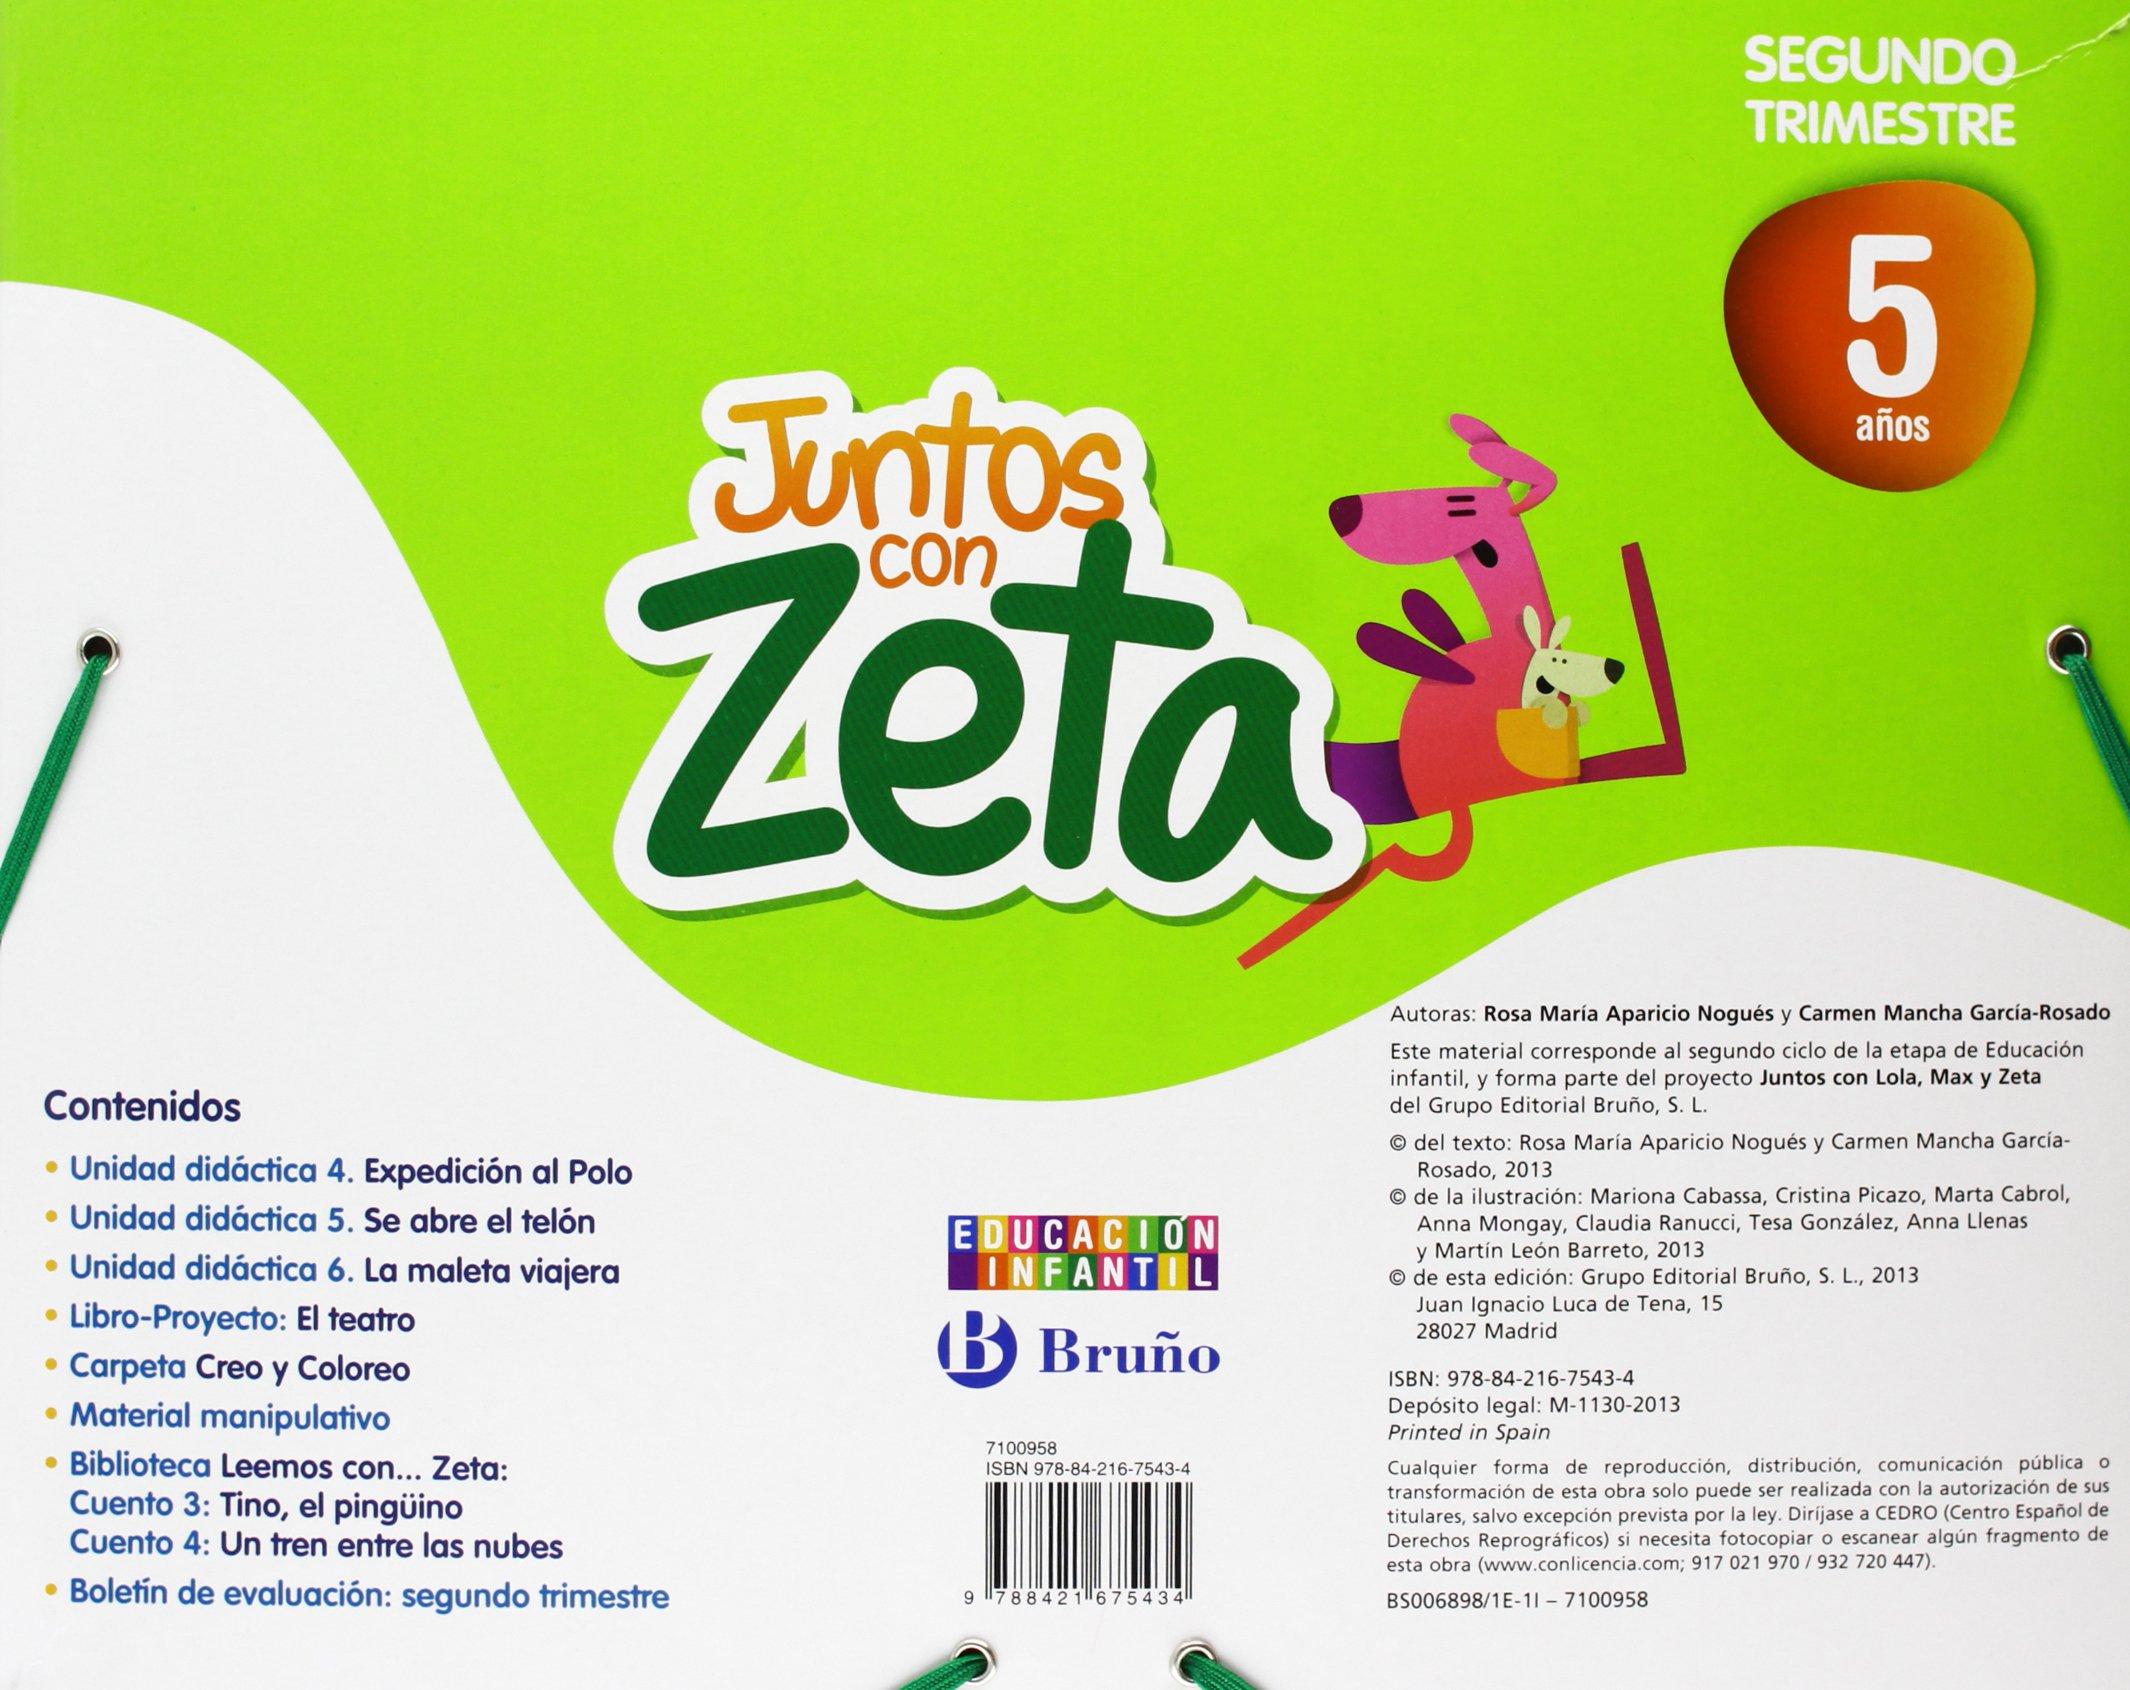 Juntos con Zeta 5 años Segundo trimestre: 9788421675434: Amazon.com: Books